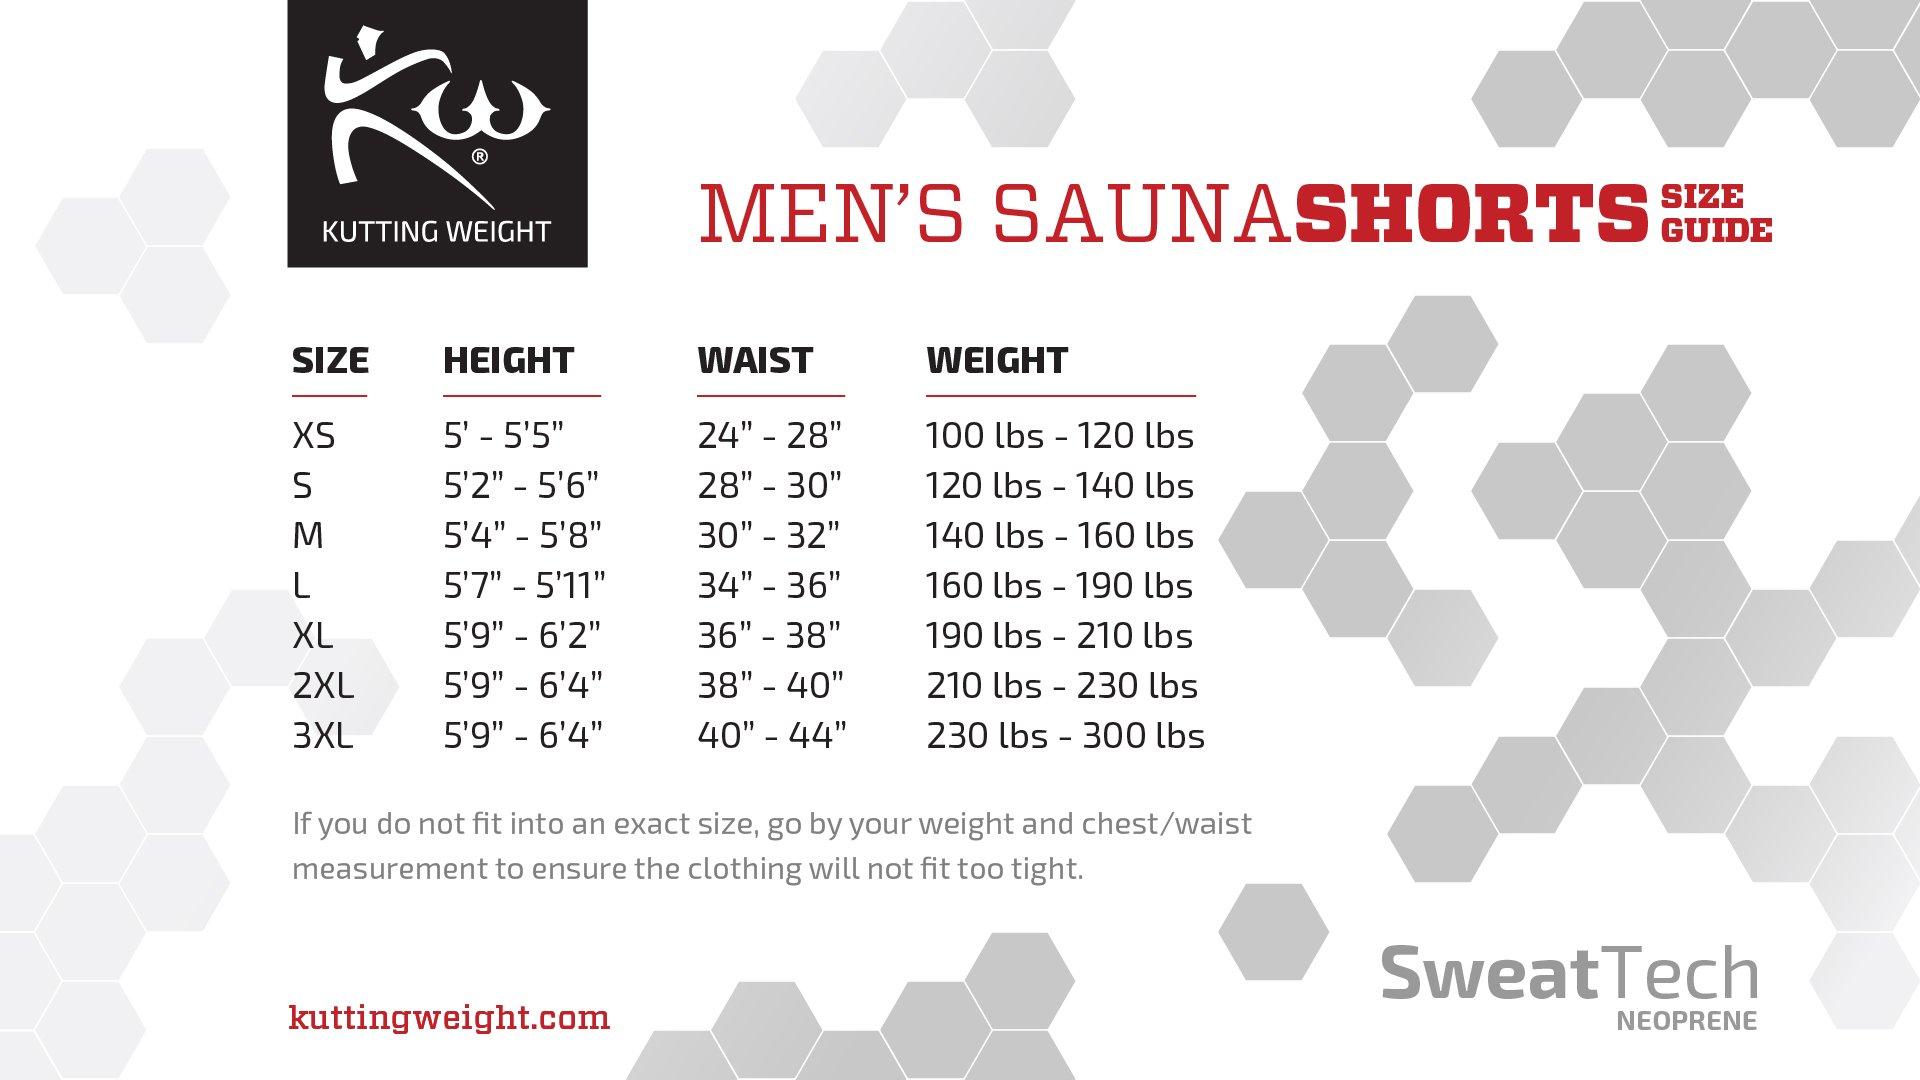 Mens- Kutting Weight (Cutting Weight) Neoprene Weight Loss Sauna Short